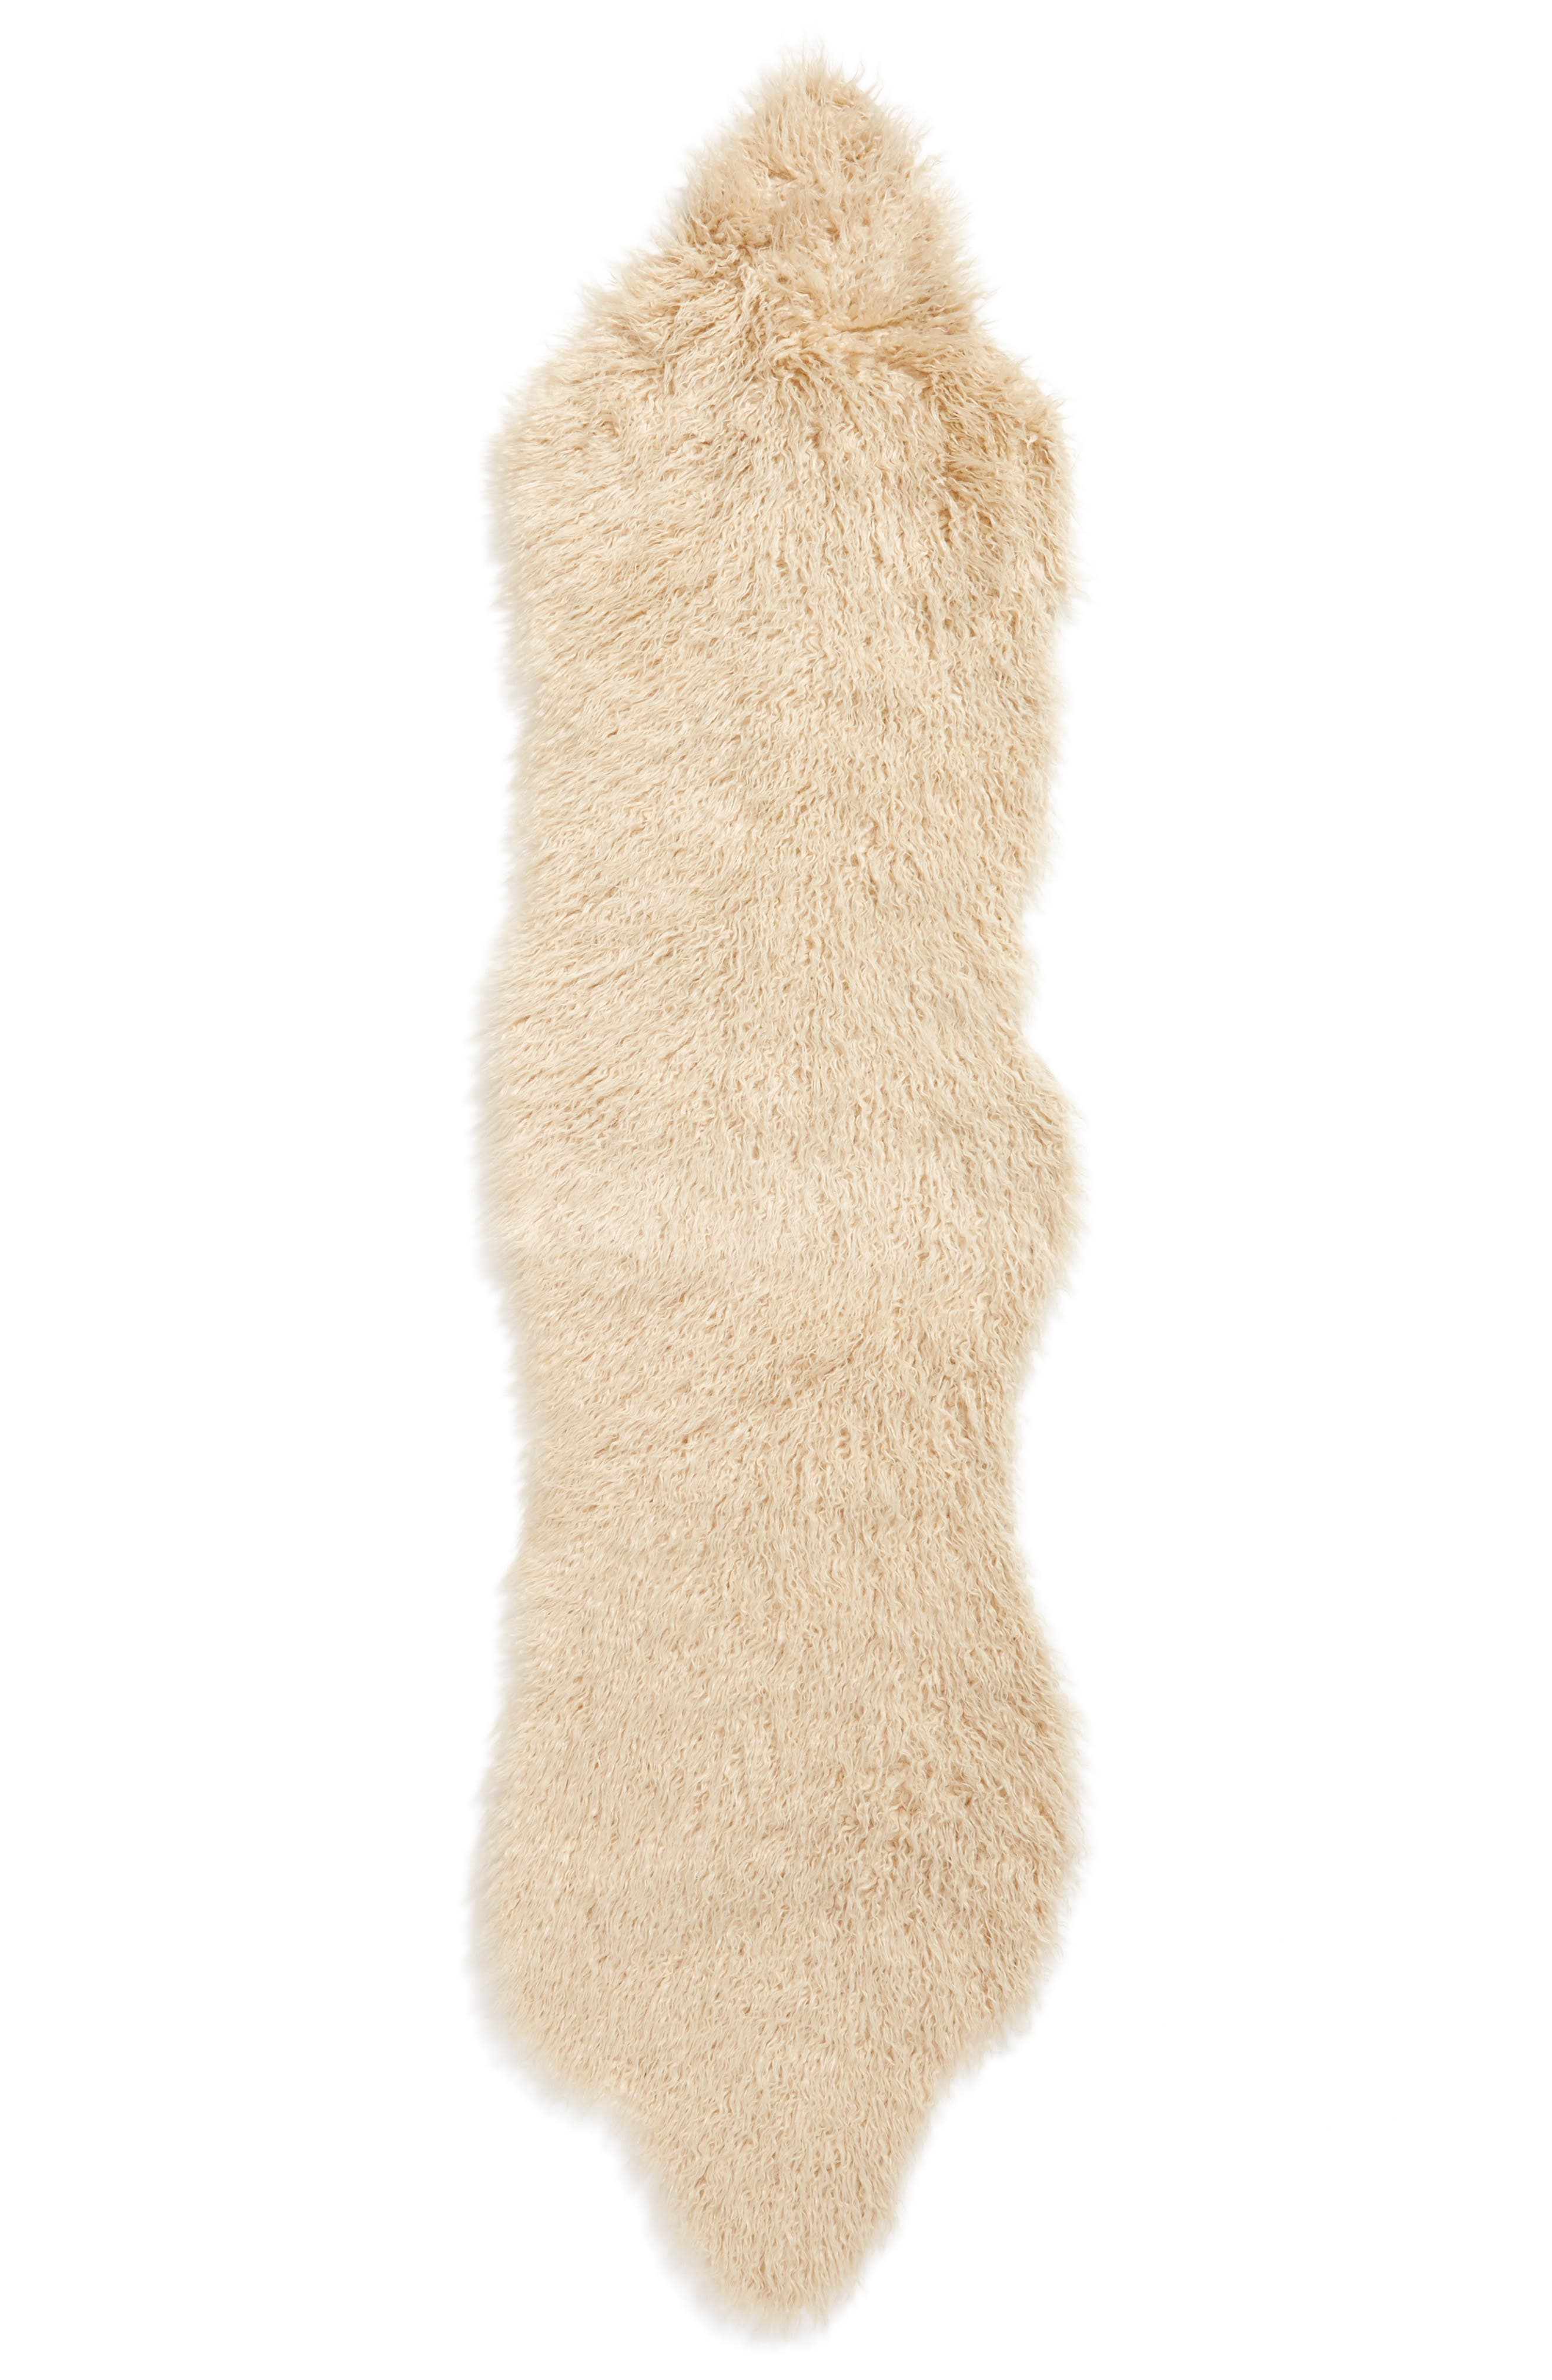 TREASURE & BOND, Curly Faux Fur Rug, Main thumbnail 1, color, 250